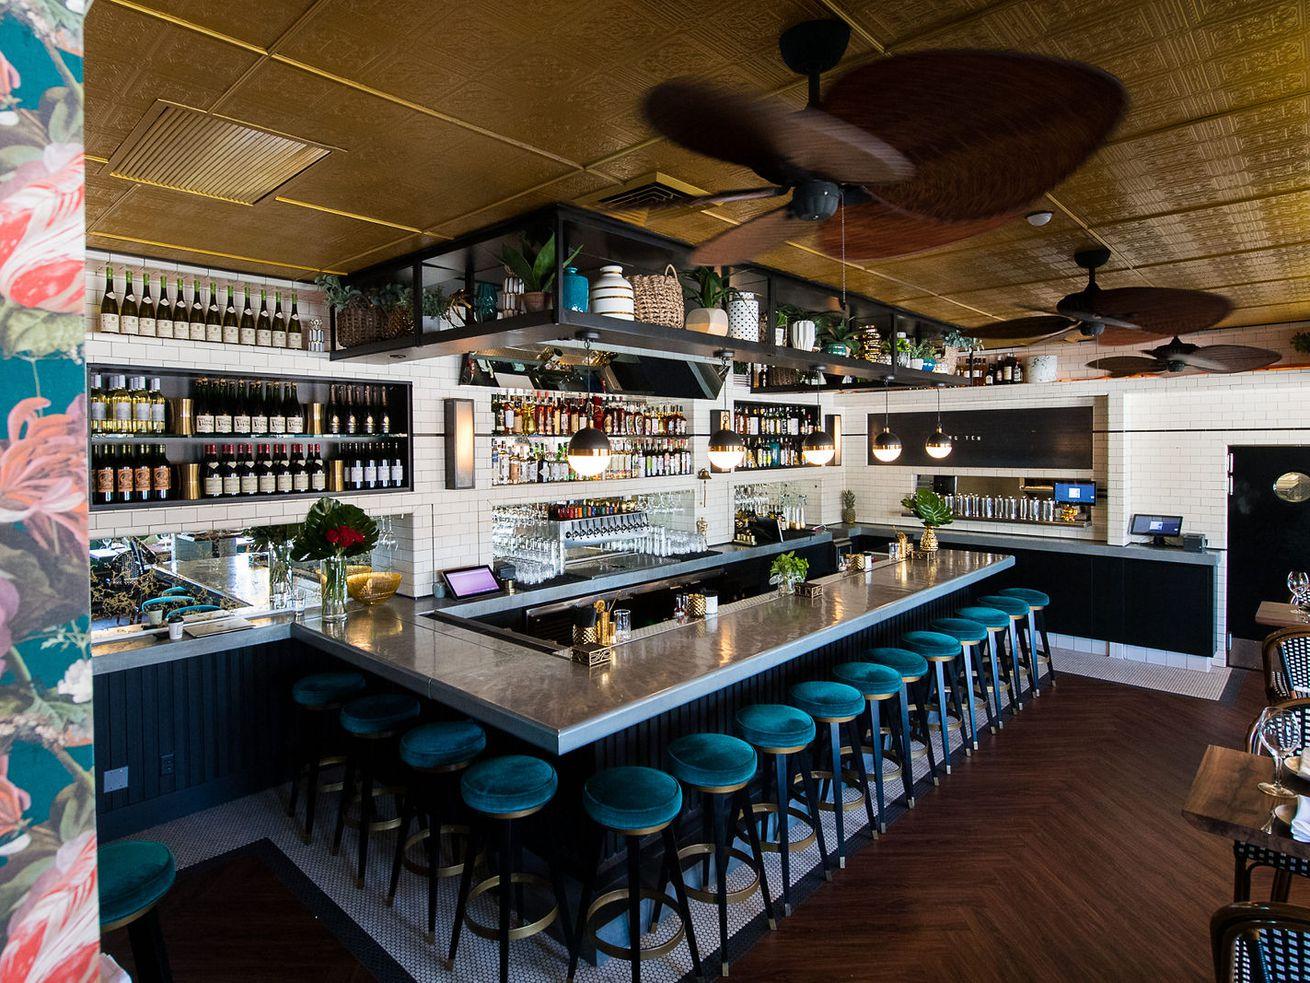 Khong Ten bar inside tabletops